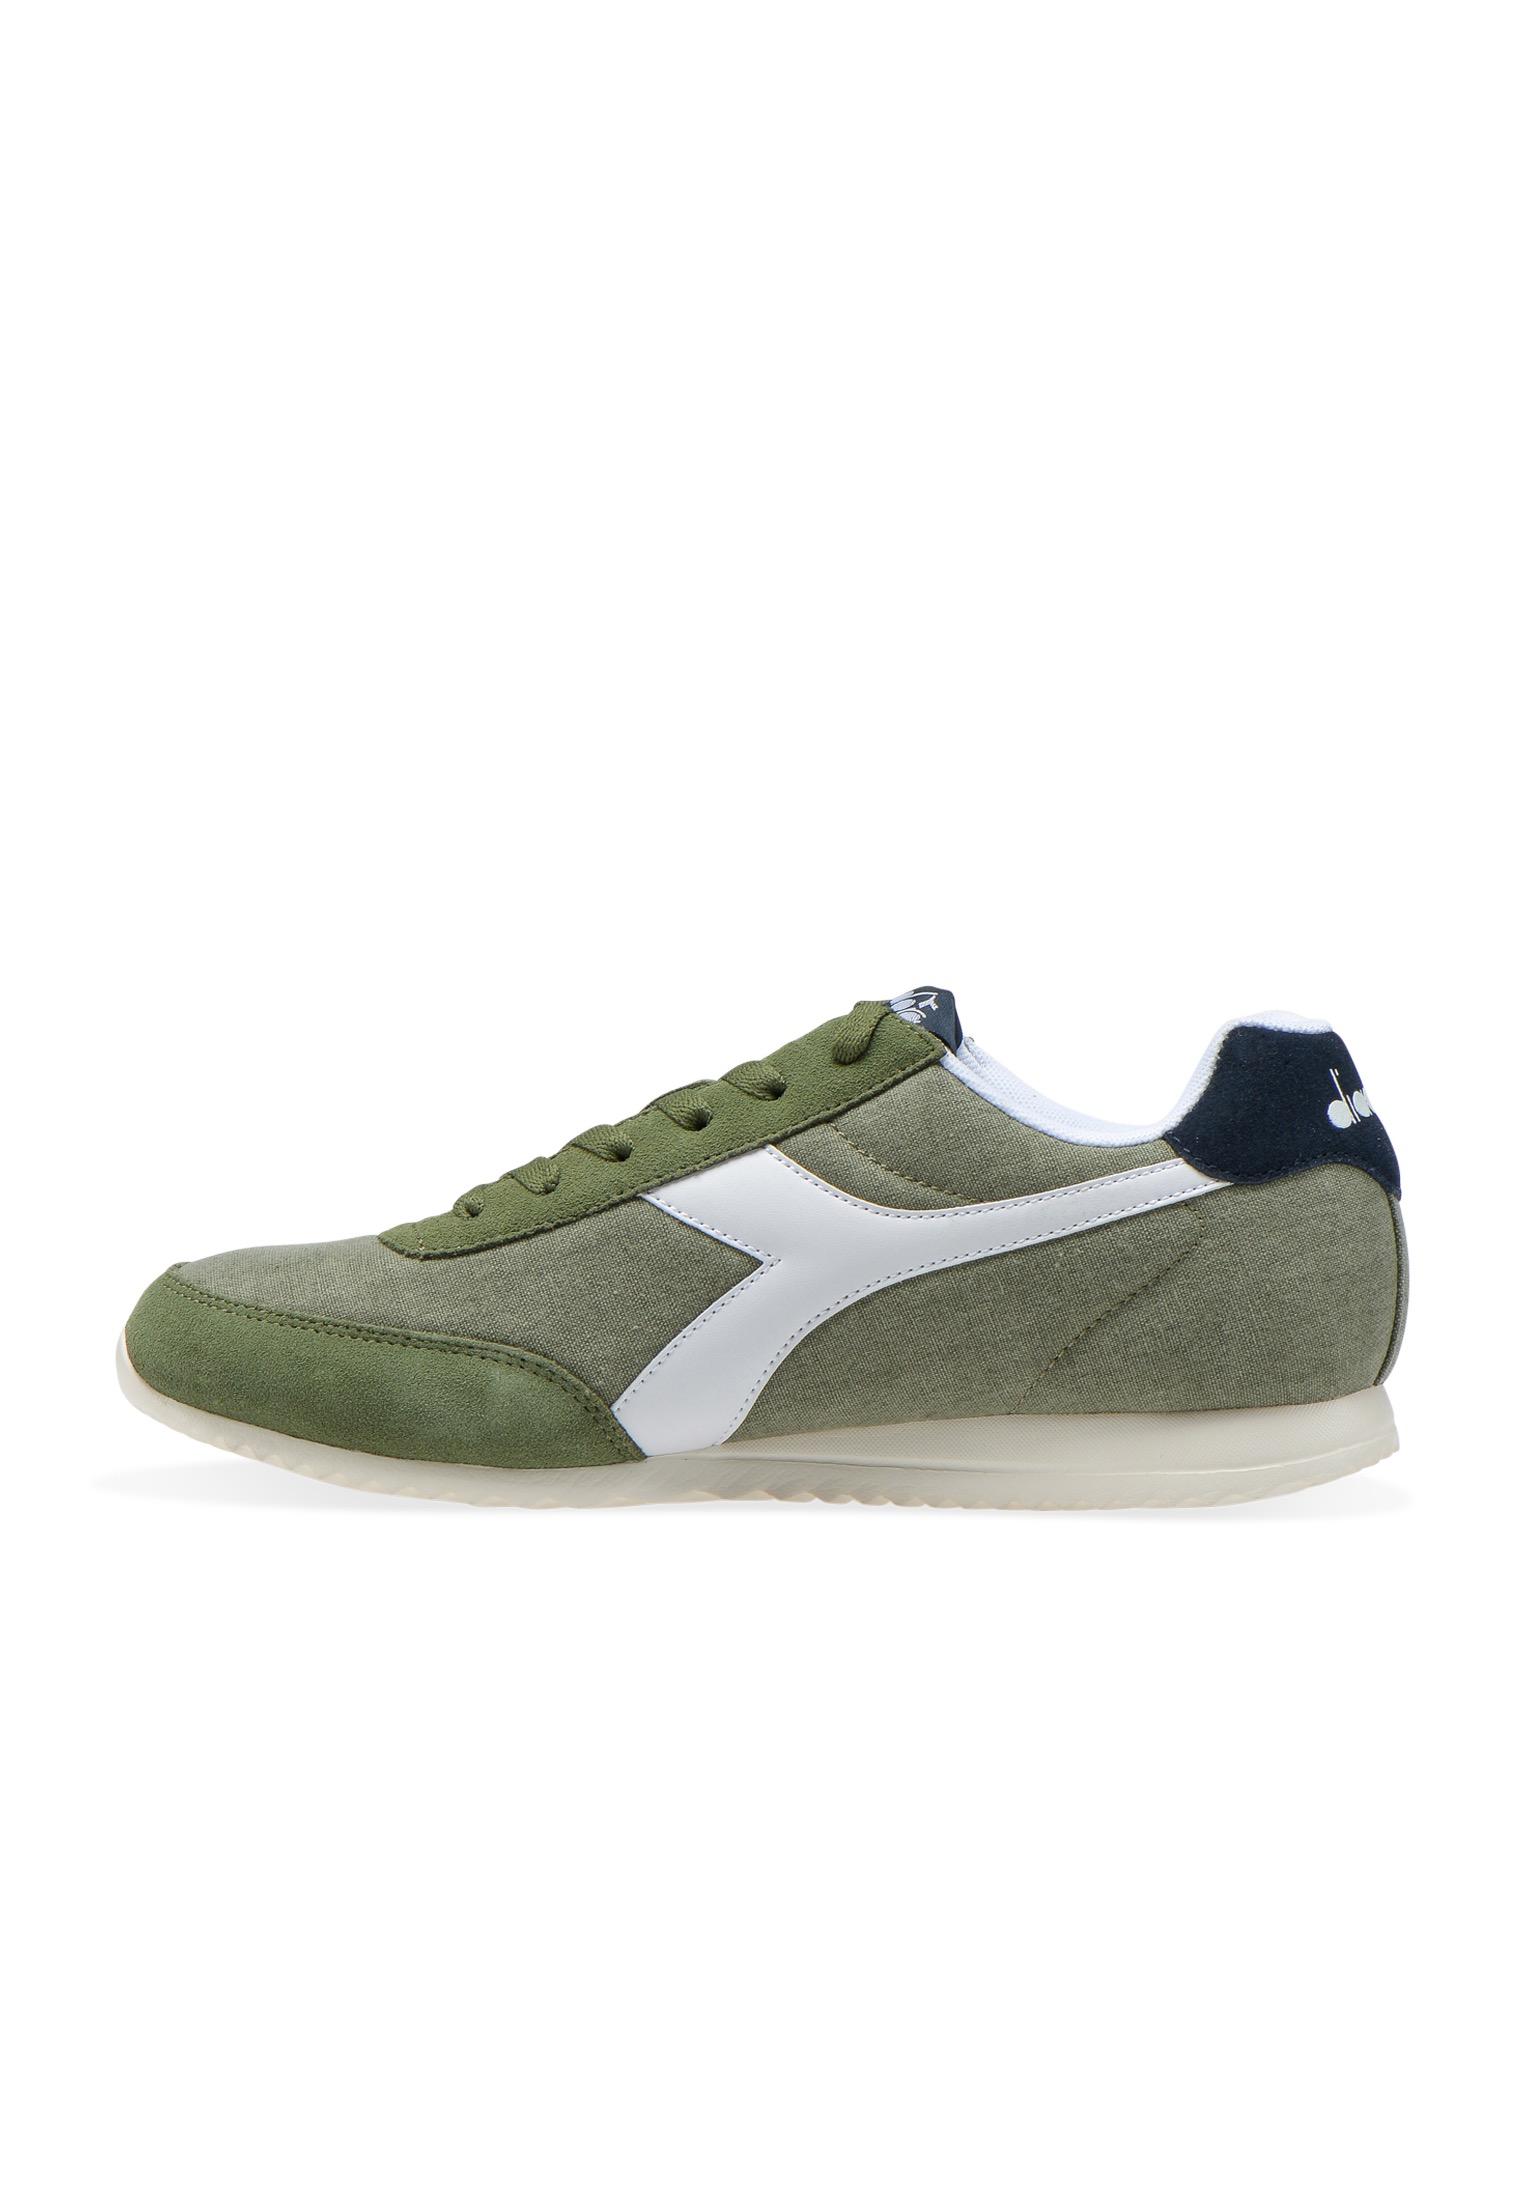 Scarpe-Diadora-Jog-Light-C-Sneakers-sportive-uomo-donna-vari-colori-e-taglie miniatura 63